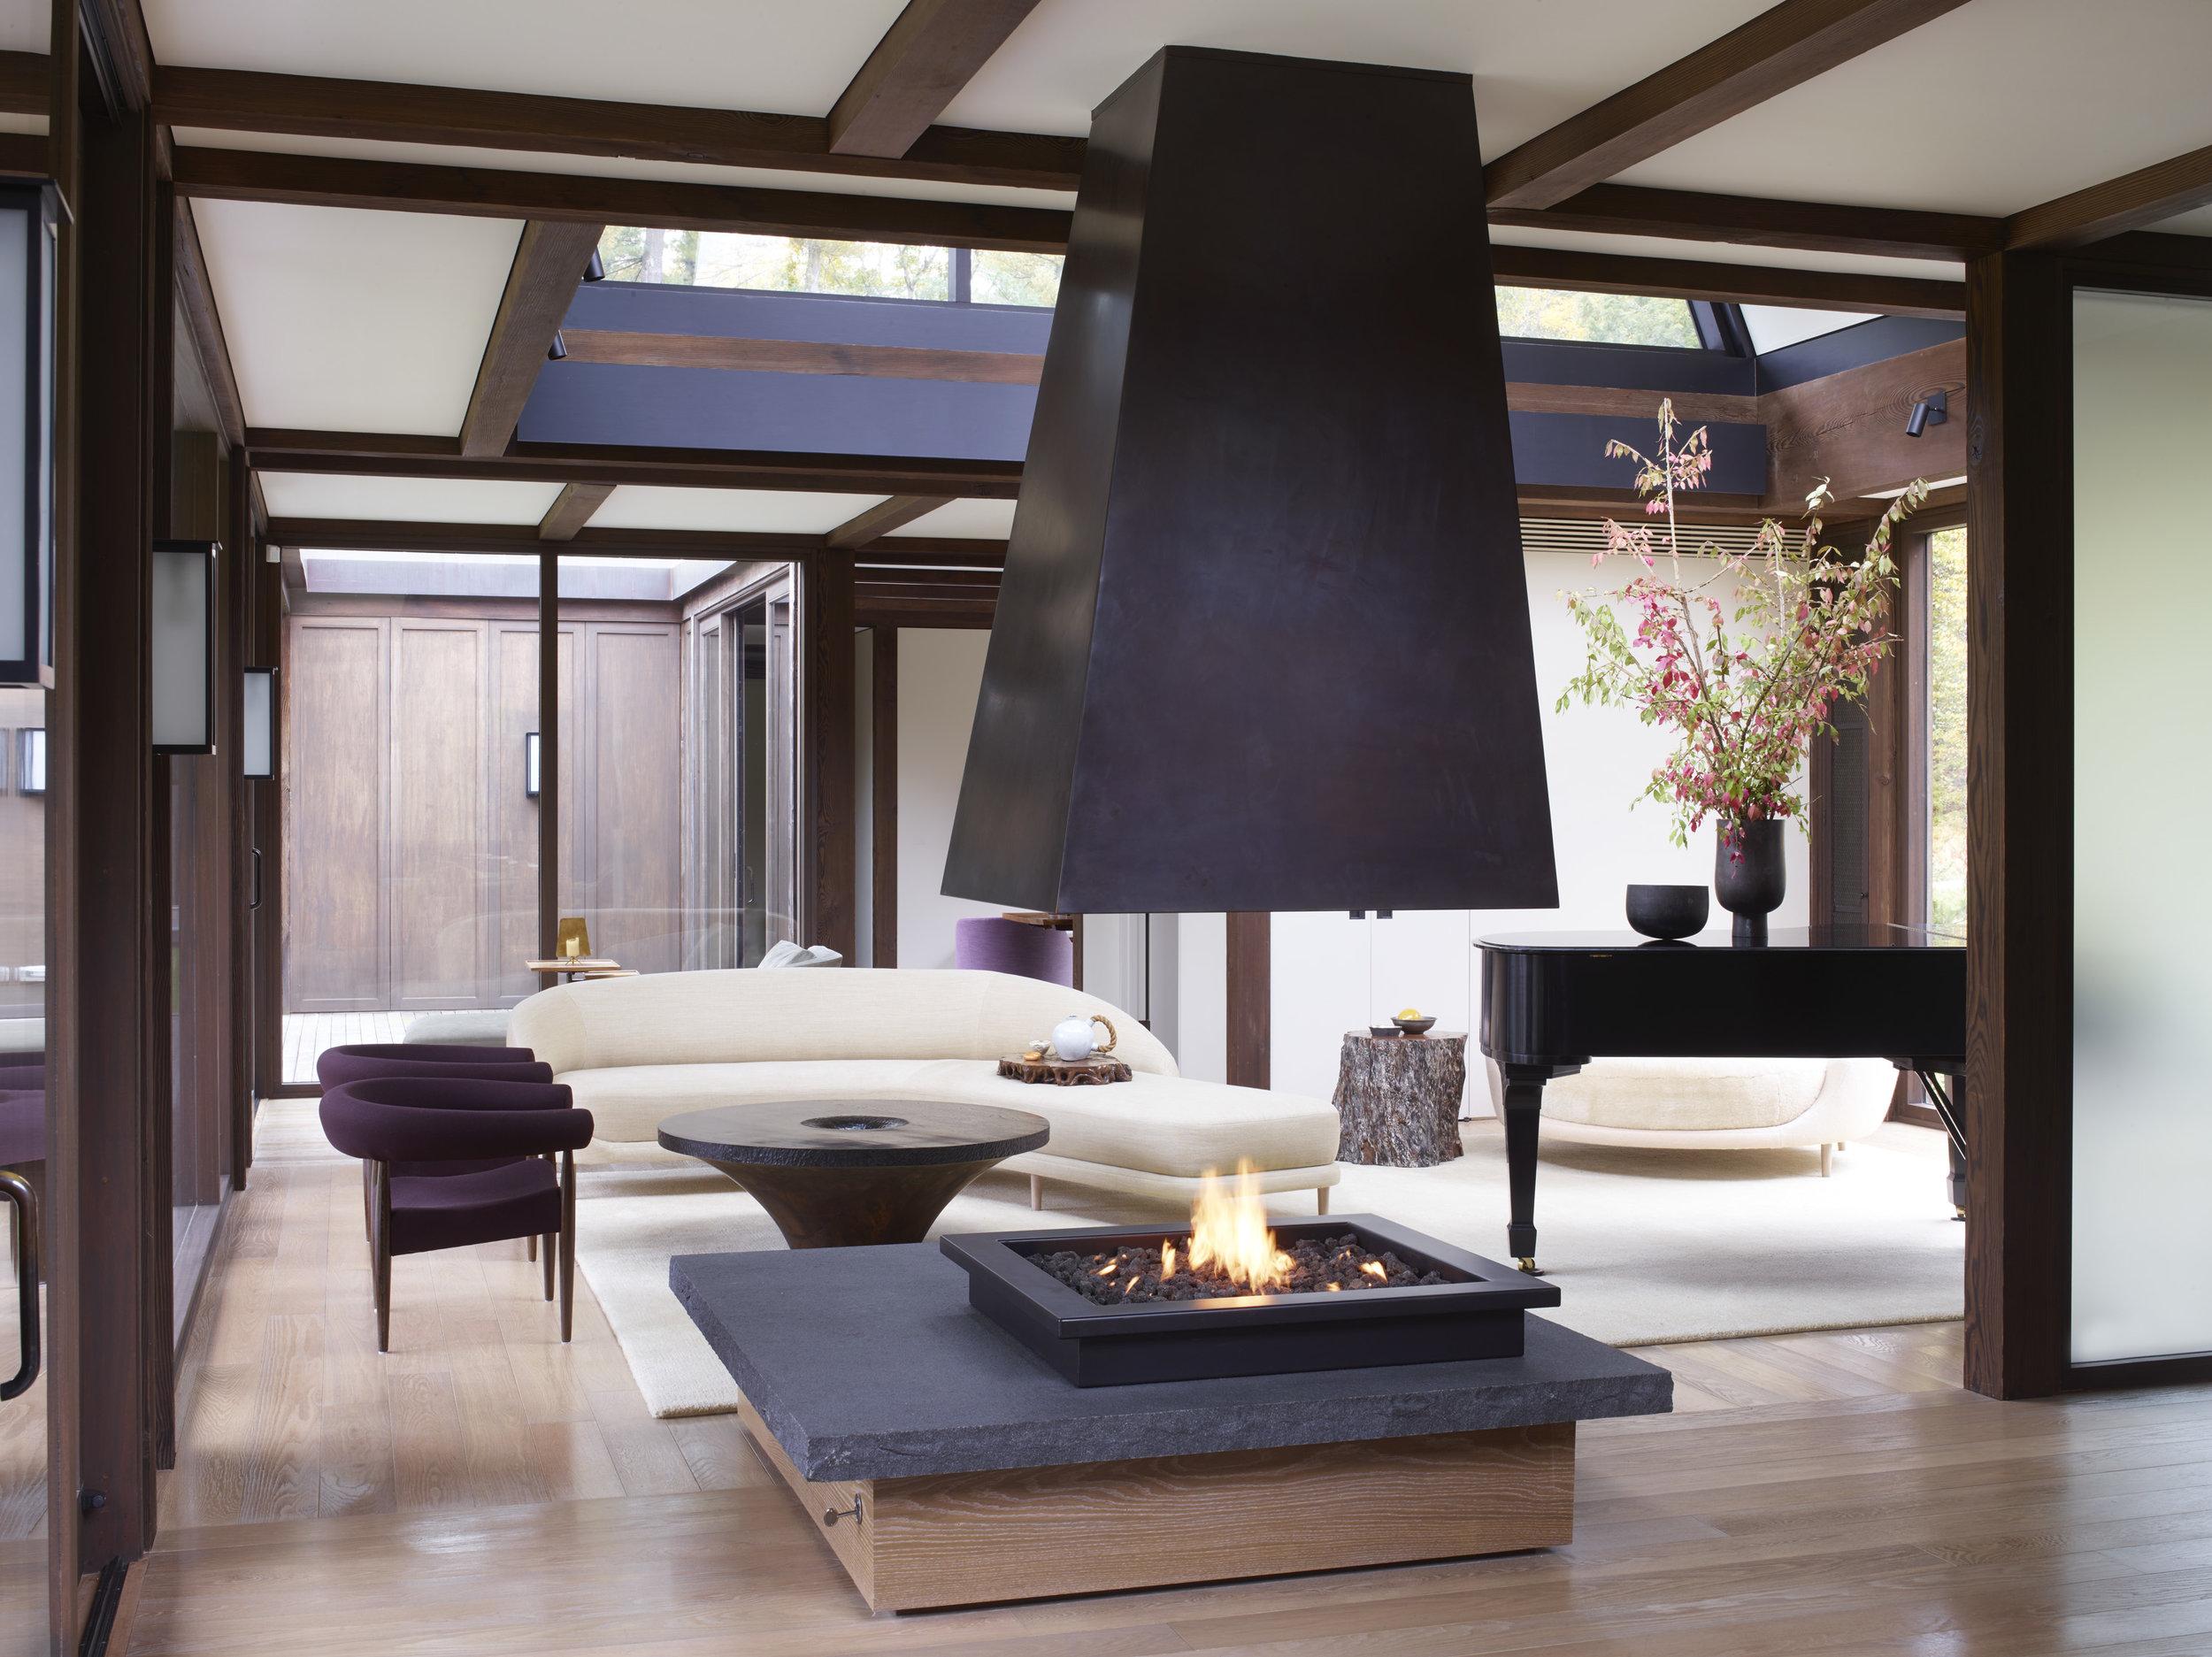 interior fireplace chimney unique